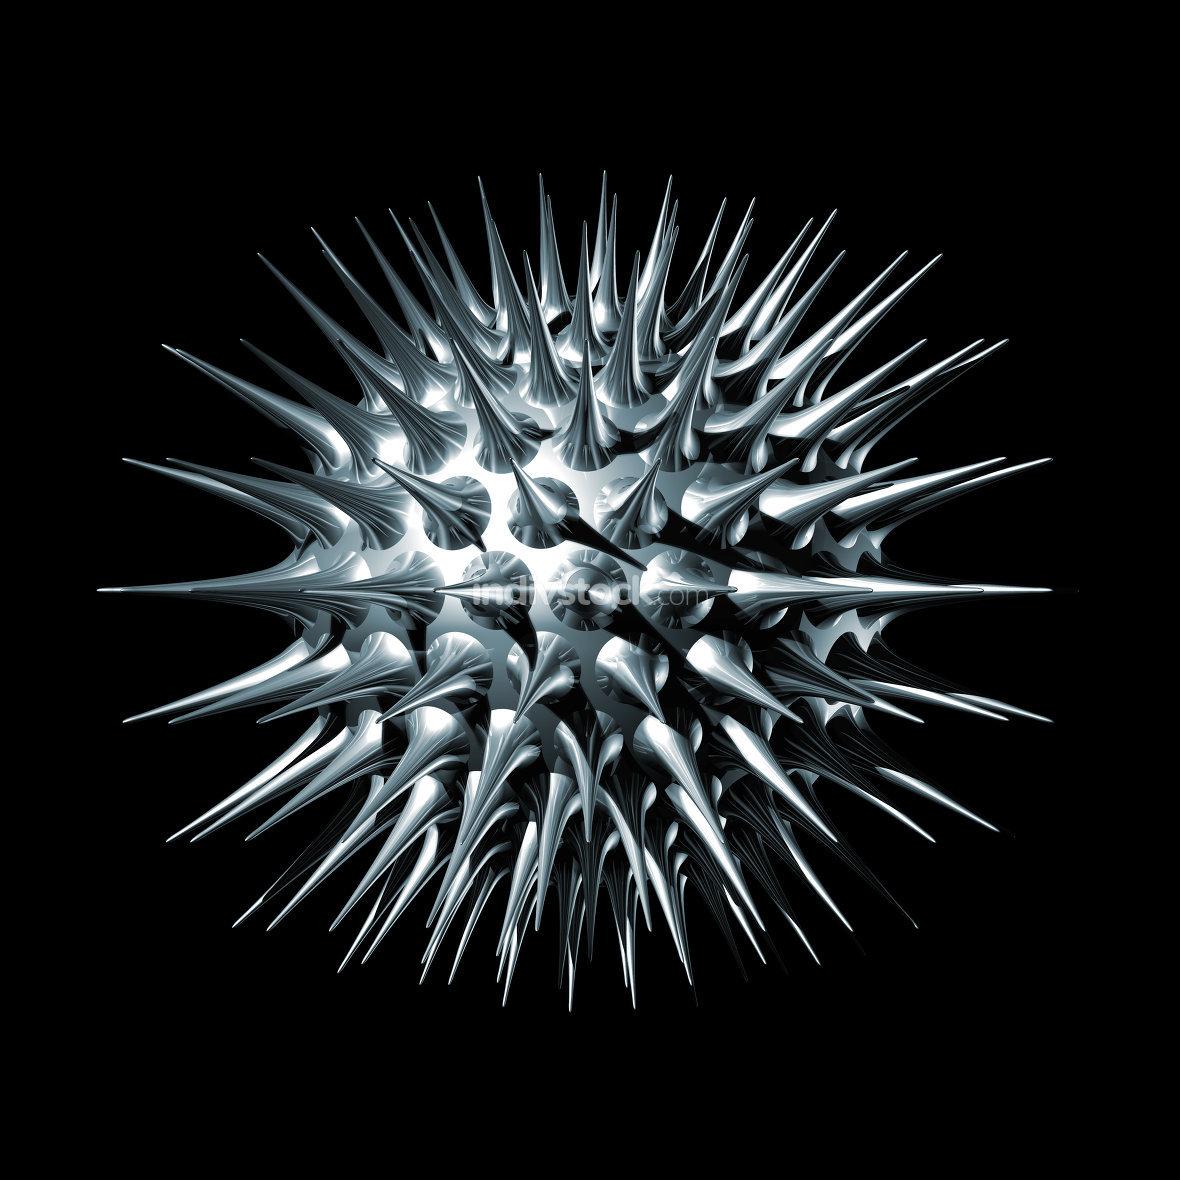 3D Metal Virus